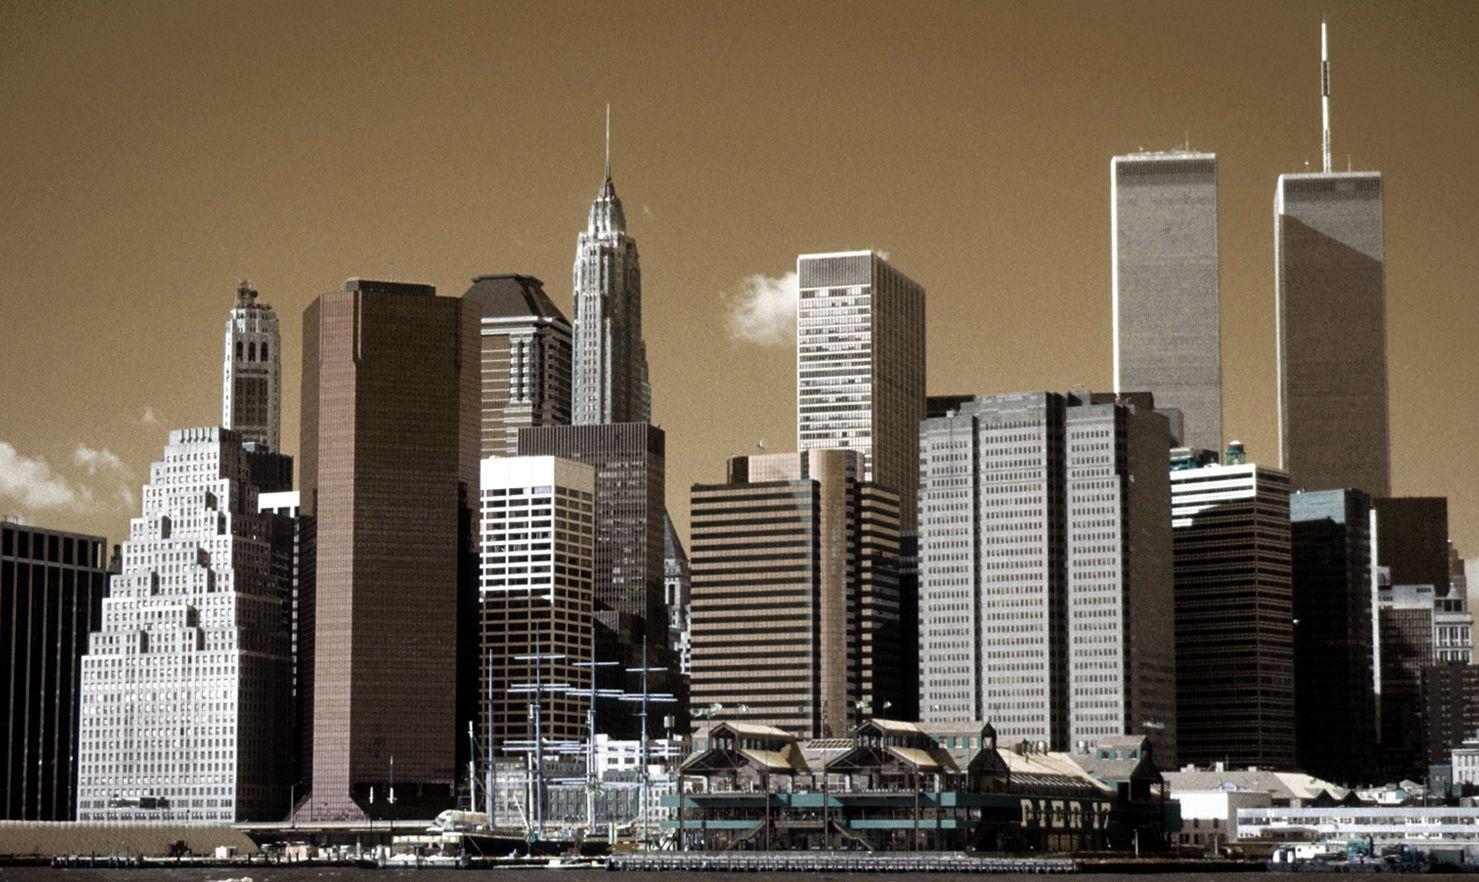 World Trade Center before 9-11